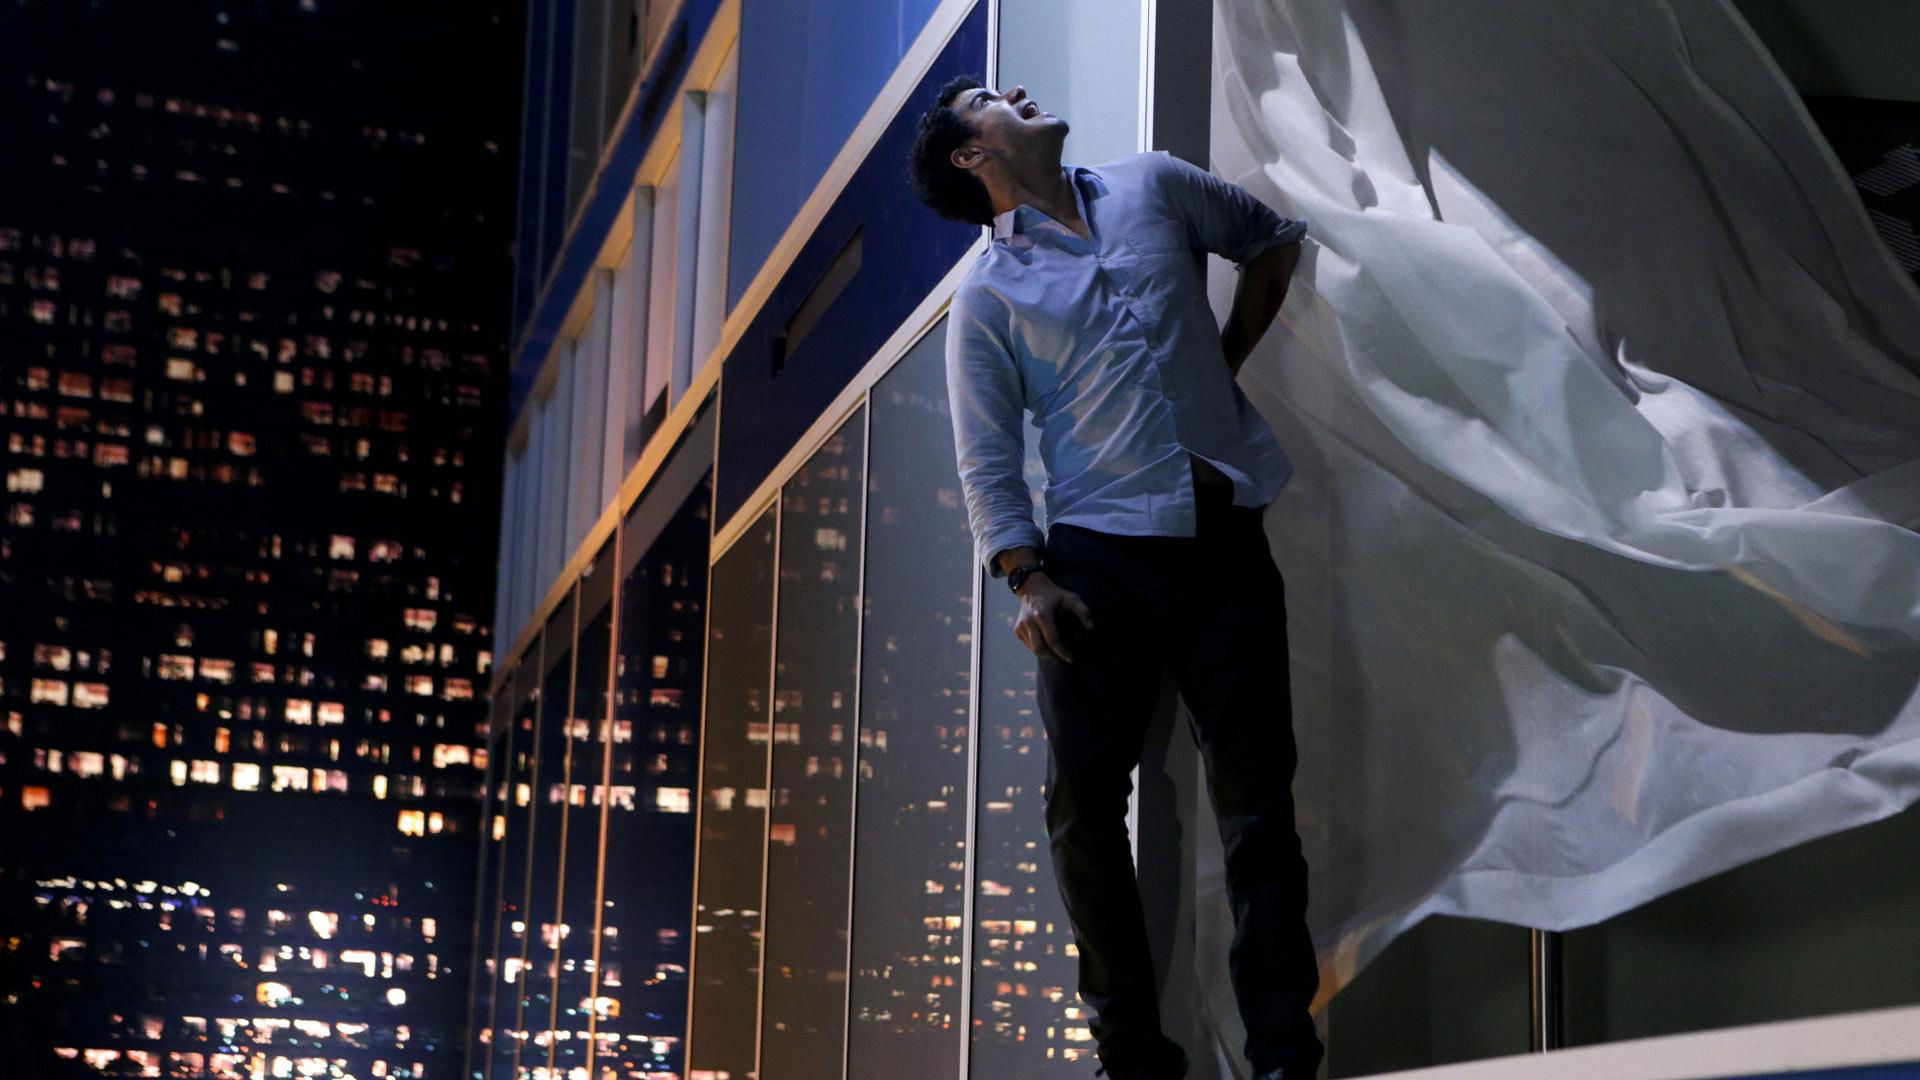 Elyes Gabel as Walter O'Brien